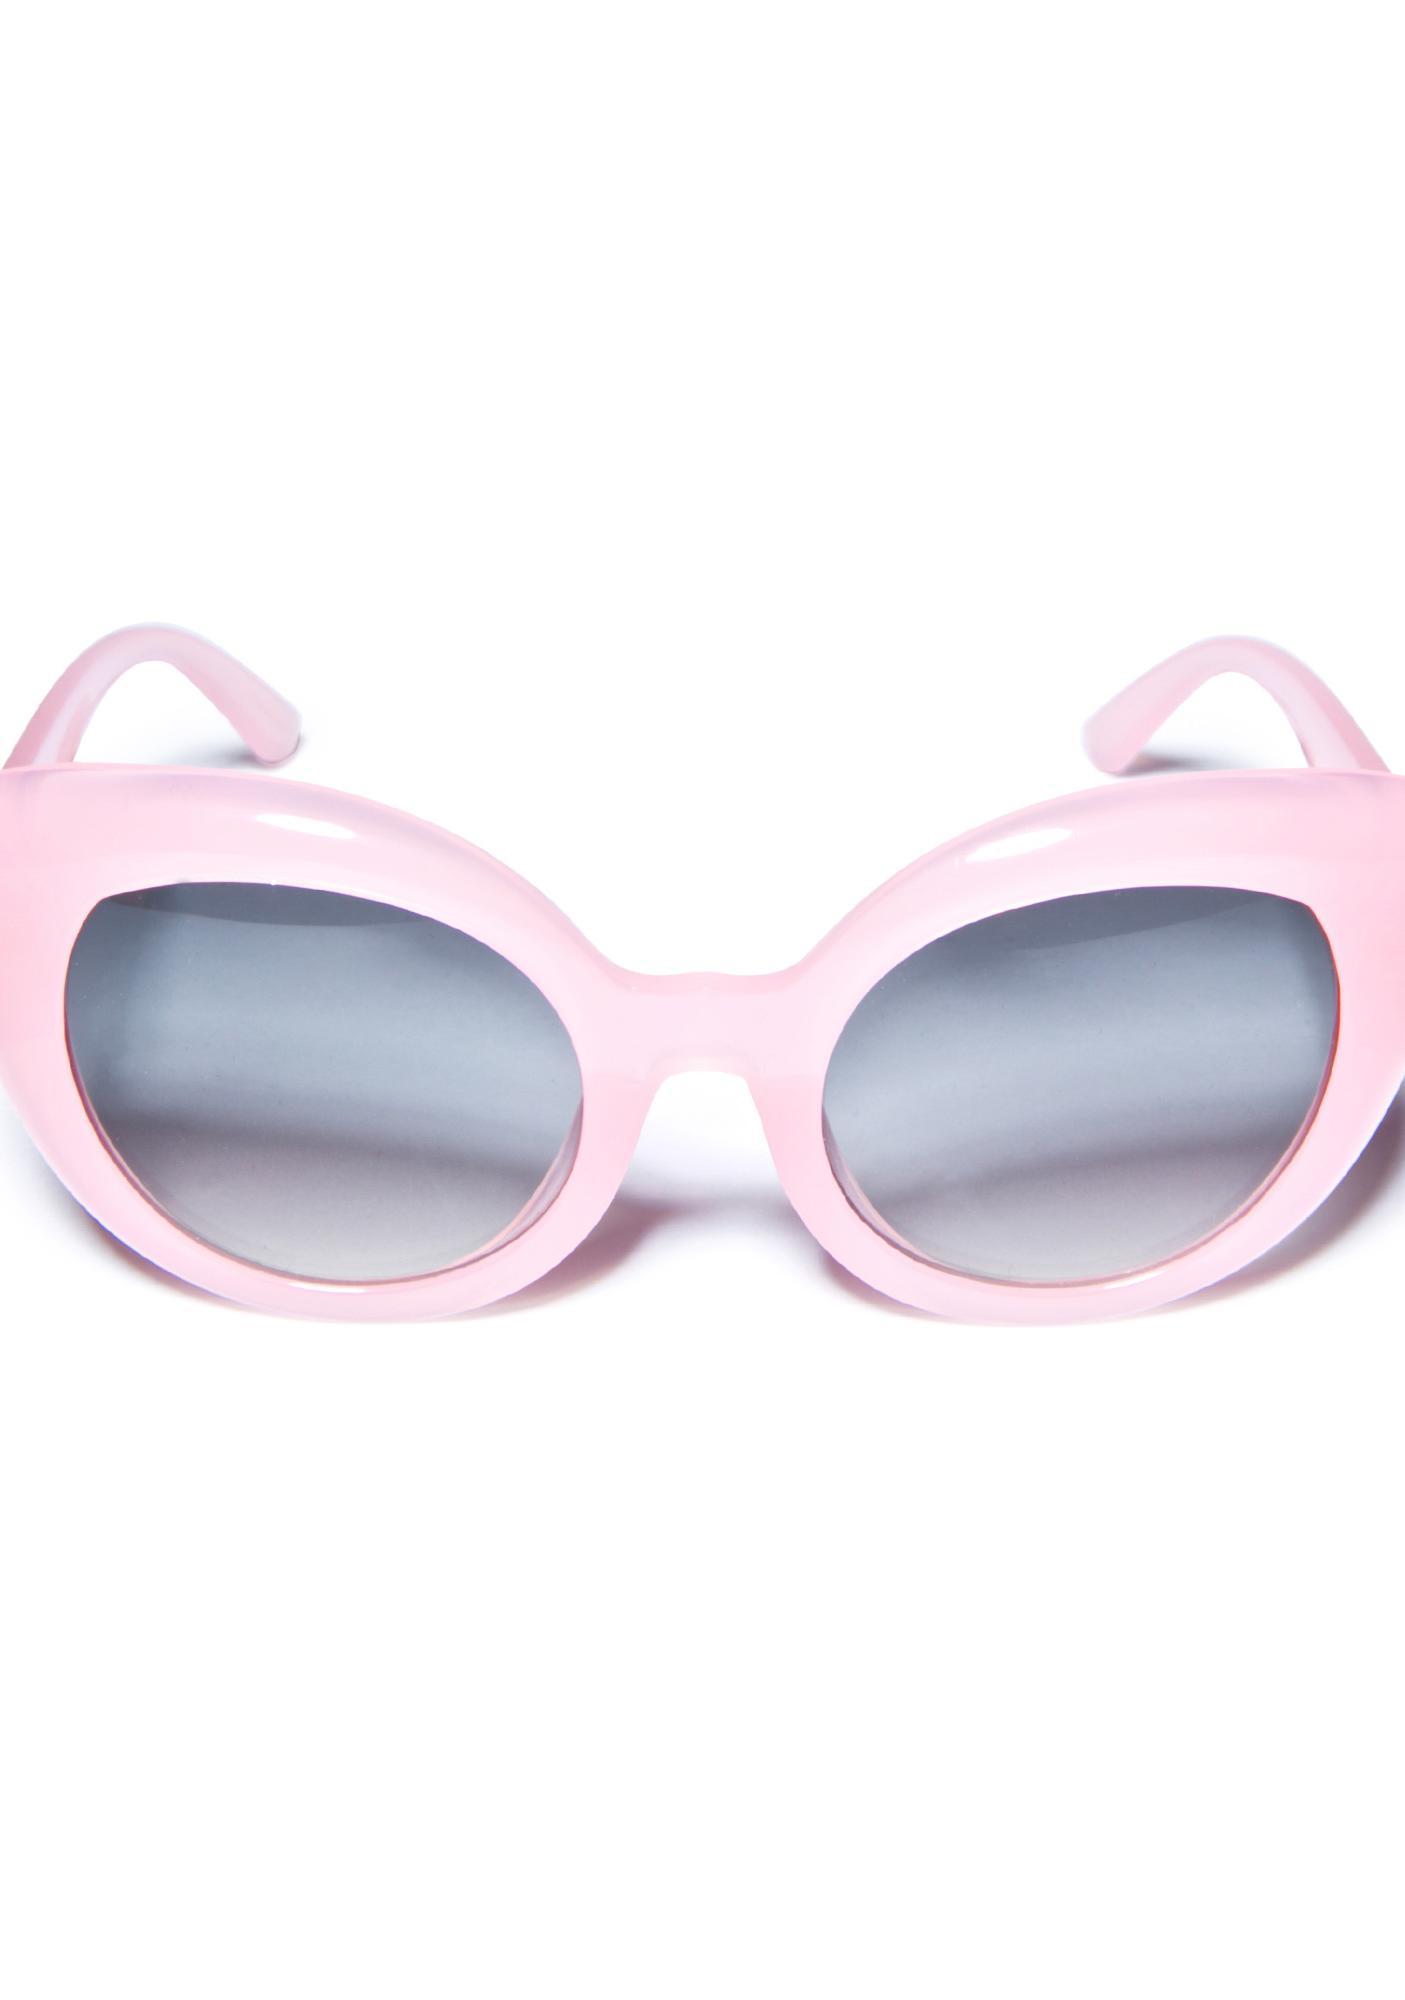 Crap Eyewear The Cotton Candy Diamond Brunch Sunglasses